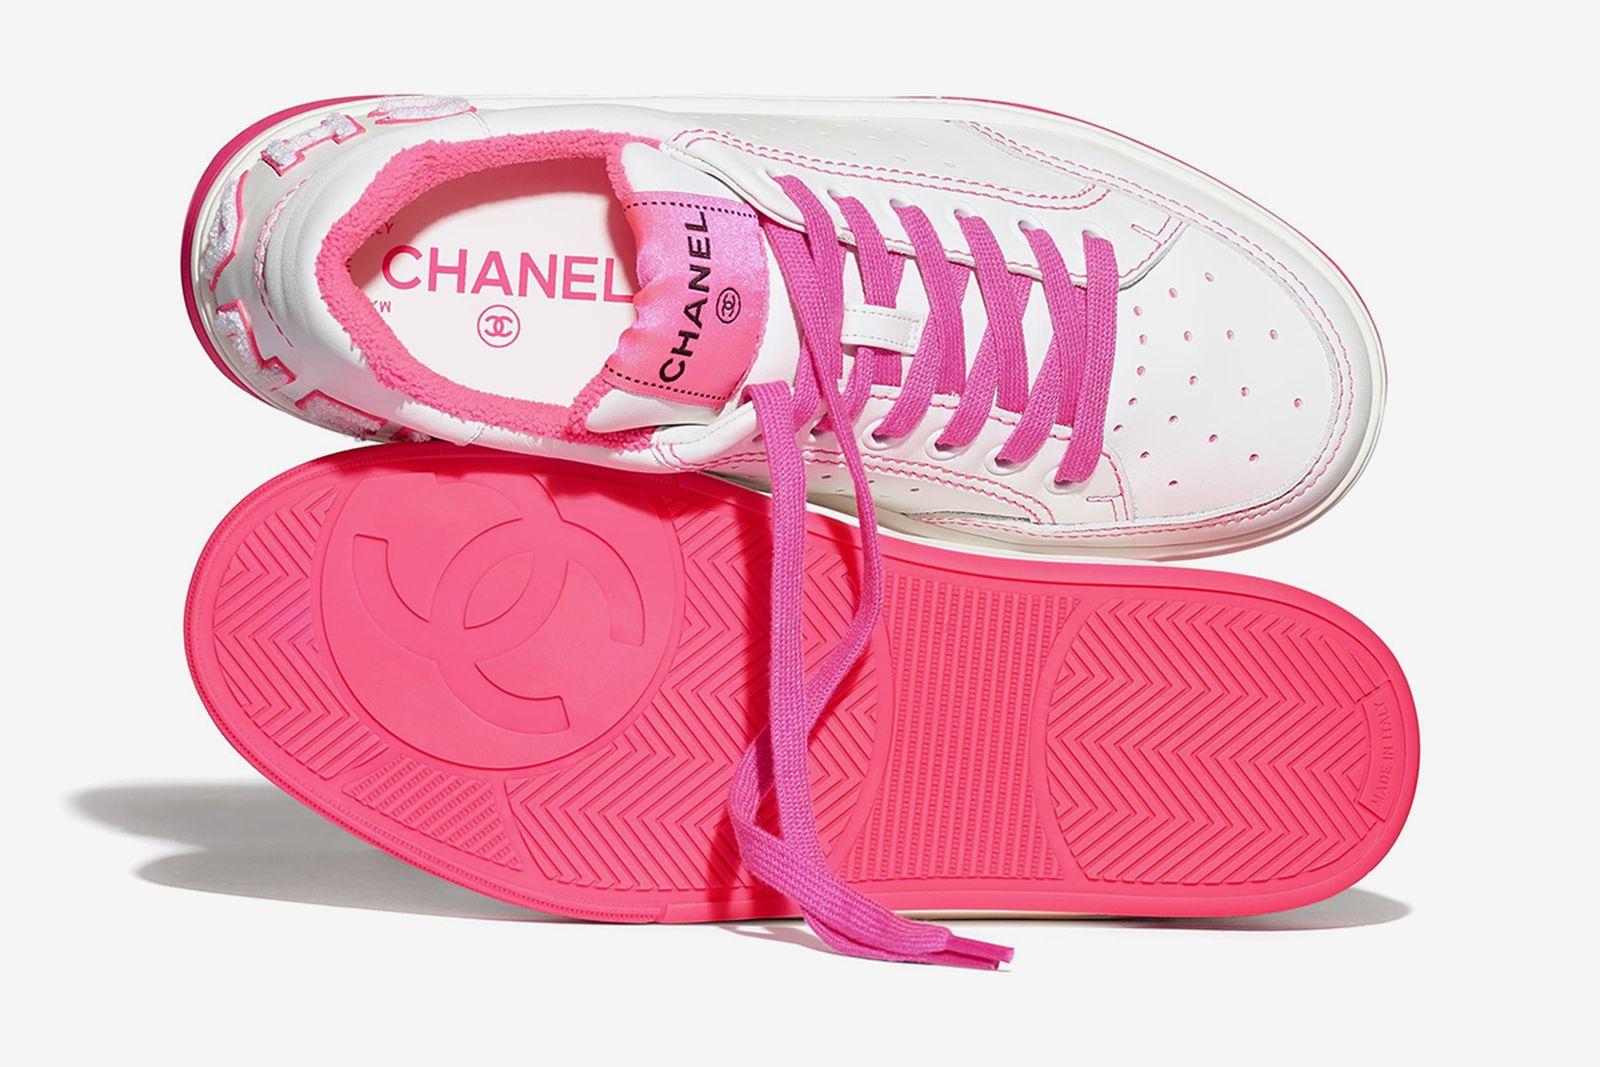 Chanel Calfskin Sneakers